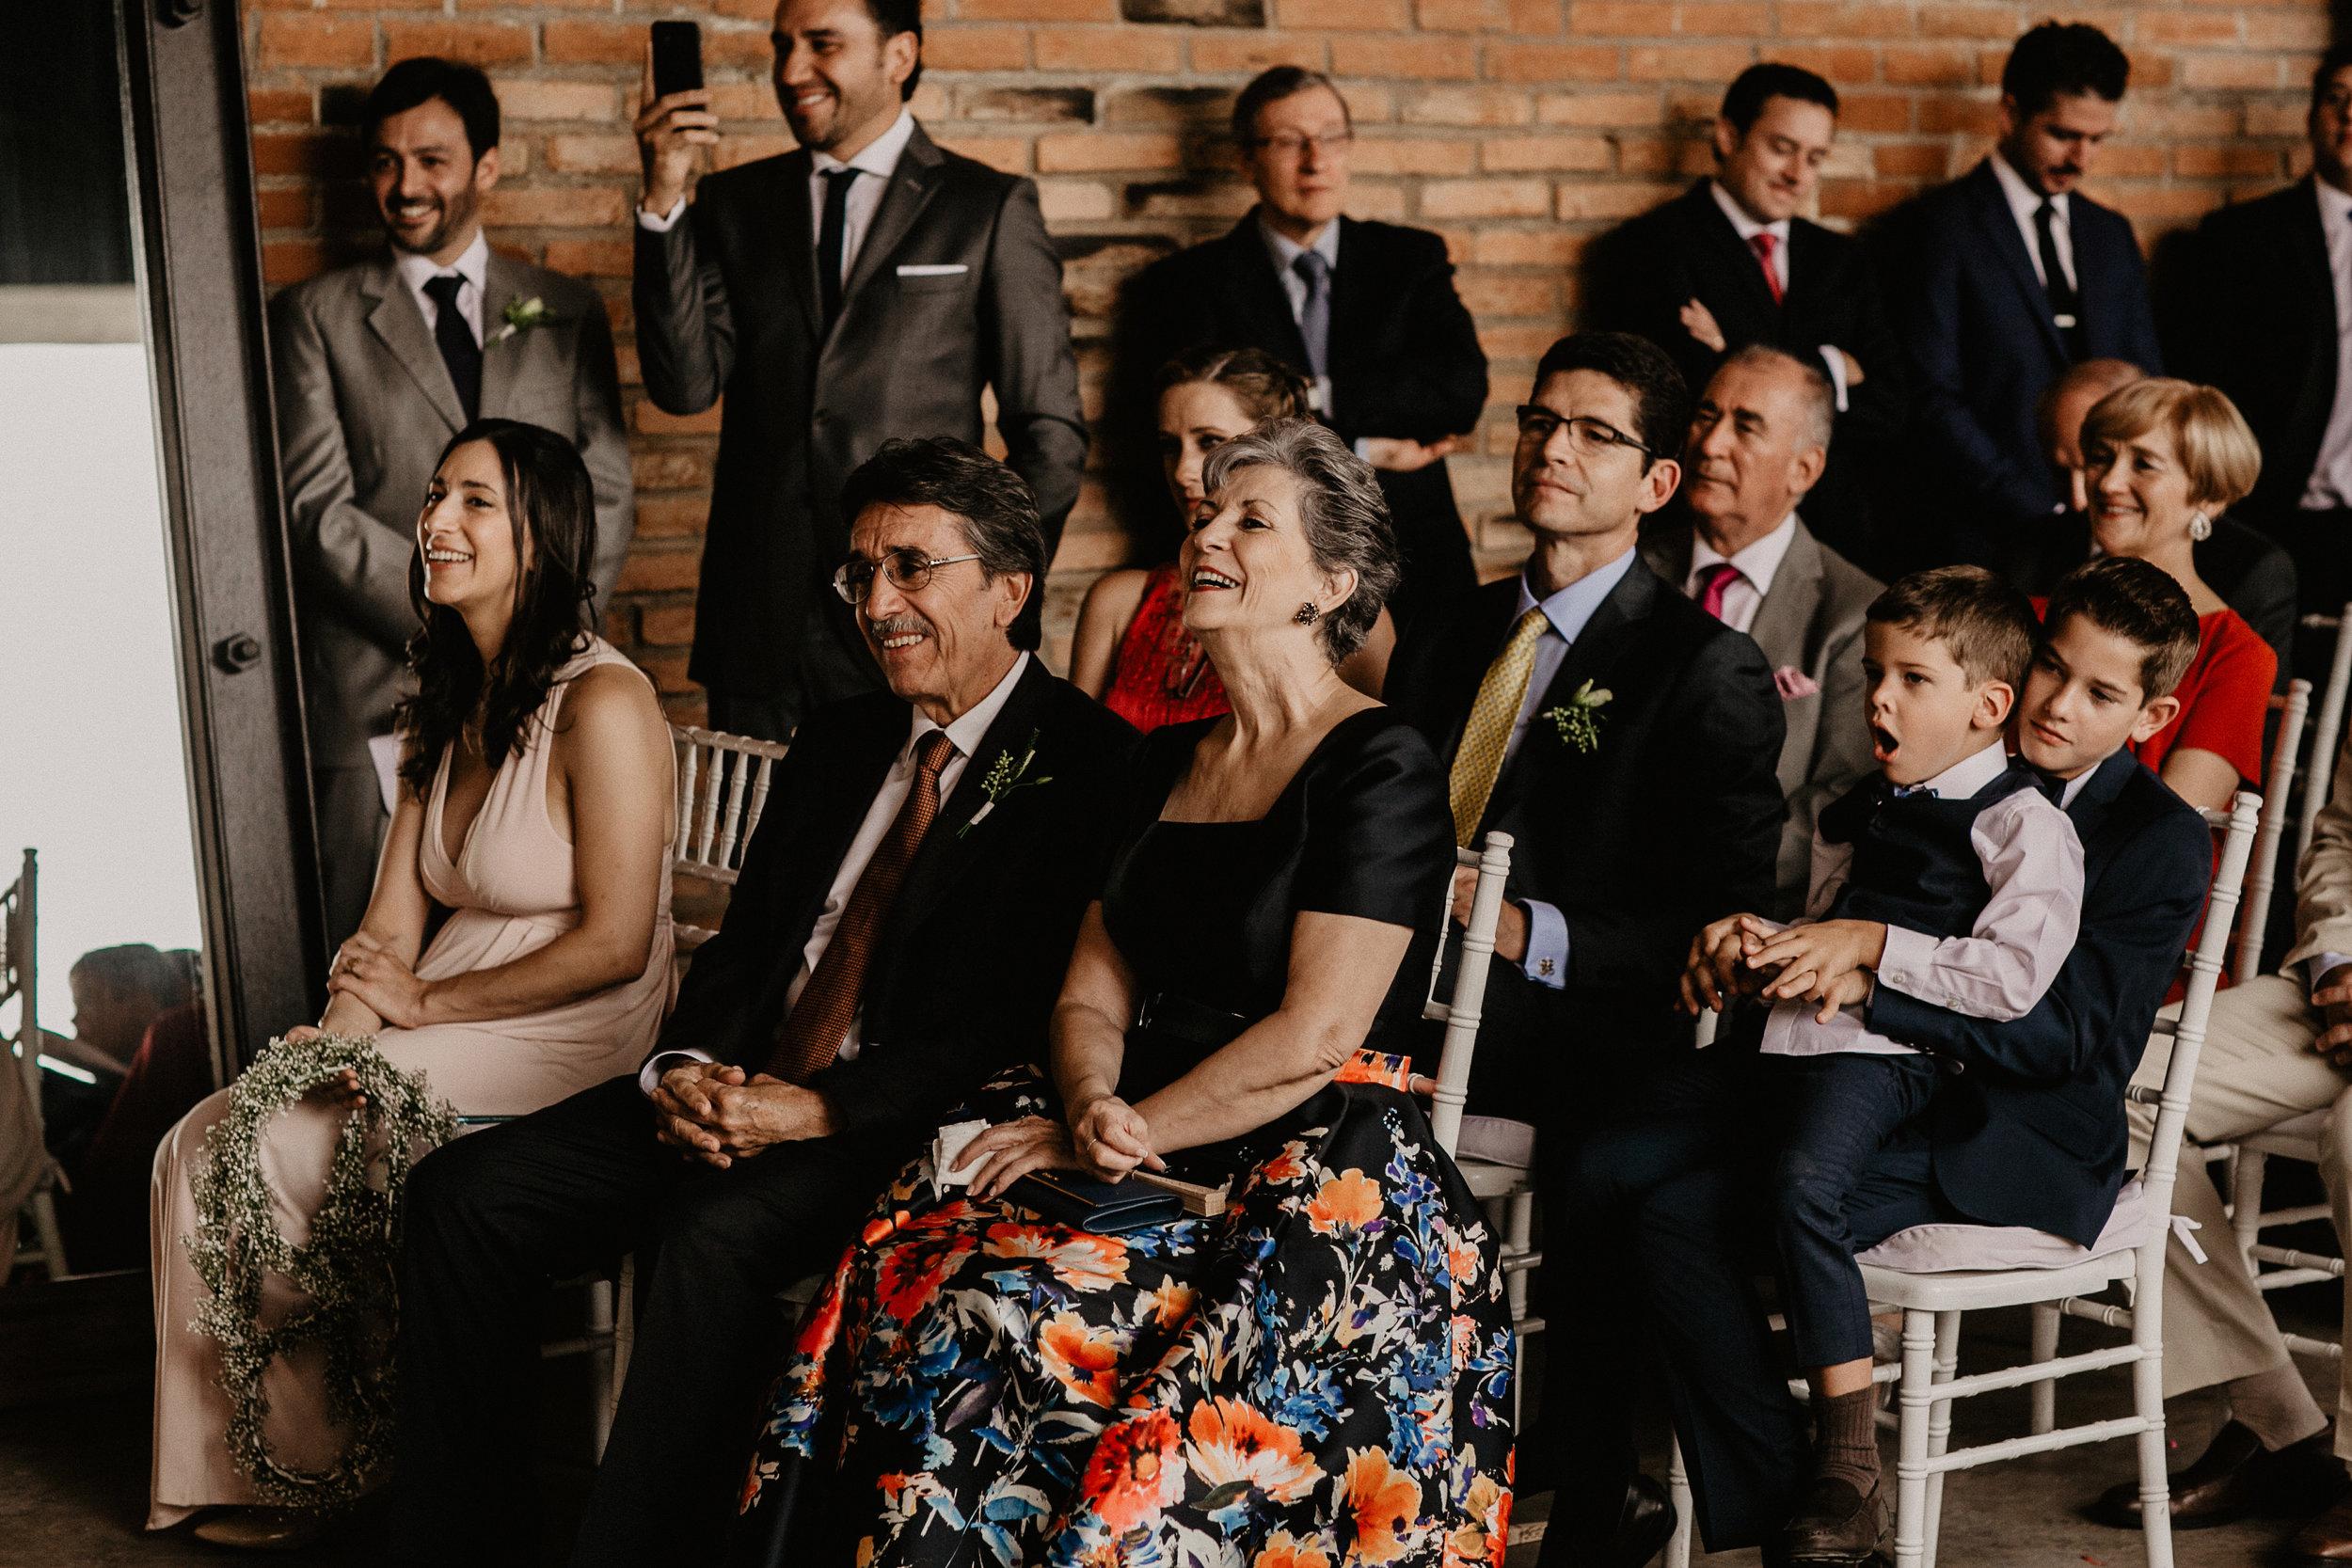 alfonso_flores_destination_wedding_photographer_pau_alonso_432.JPG